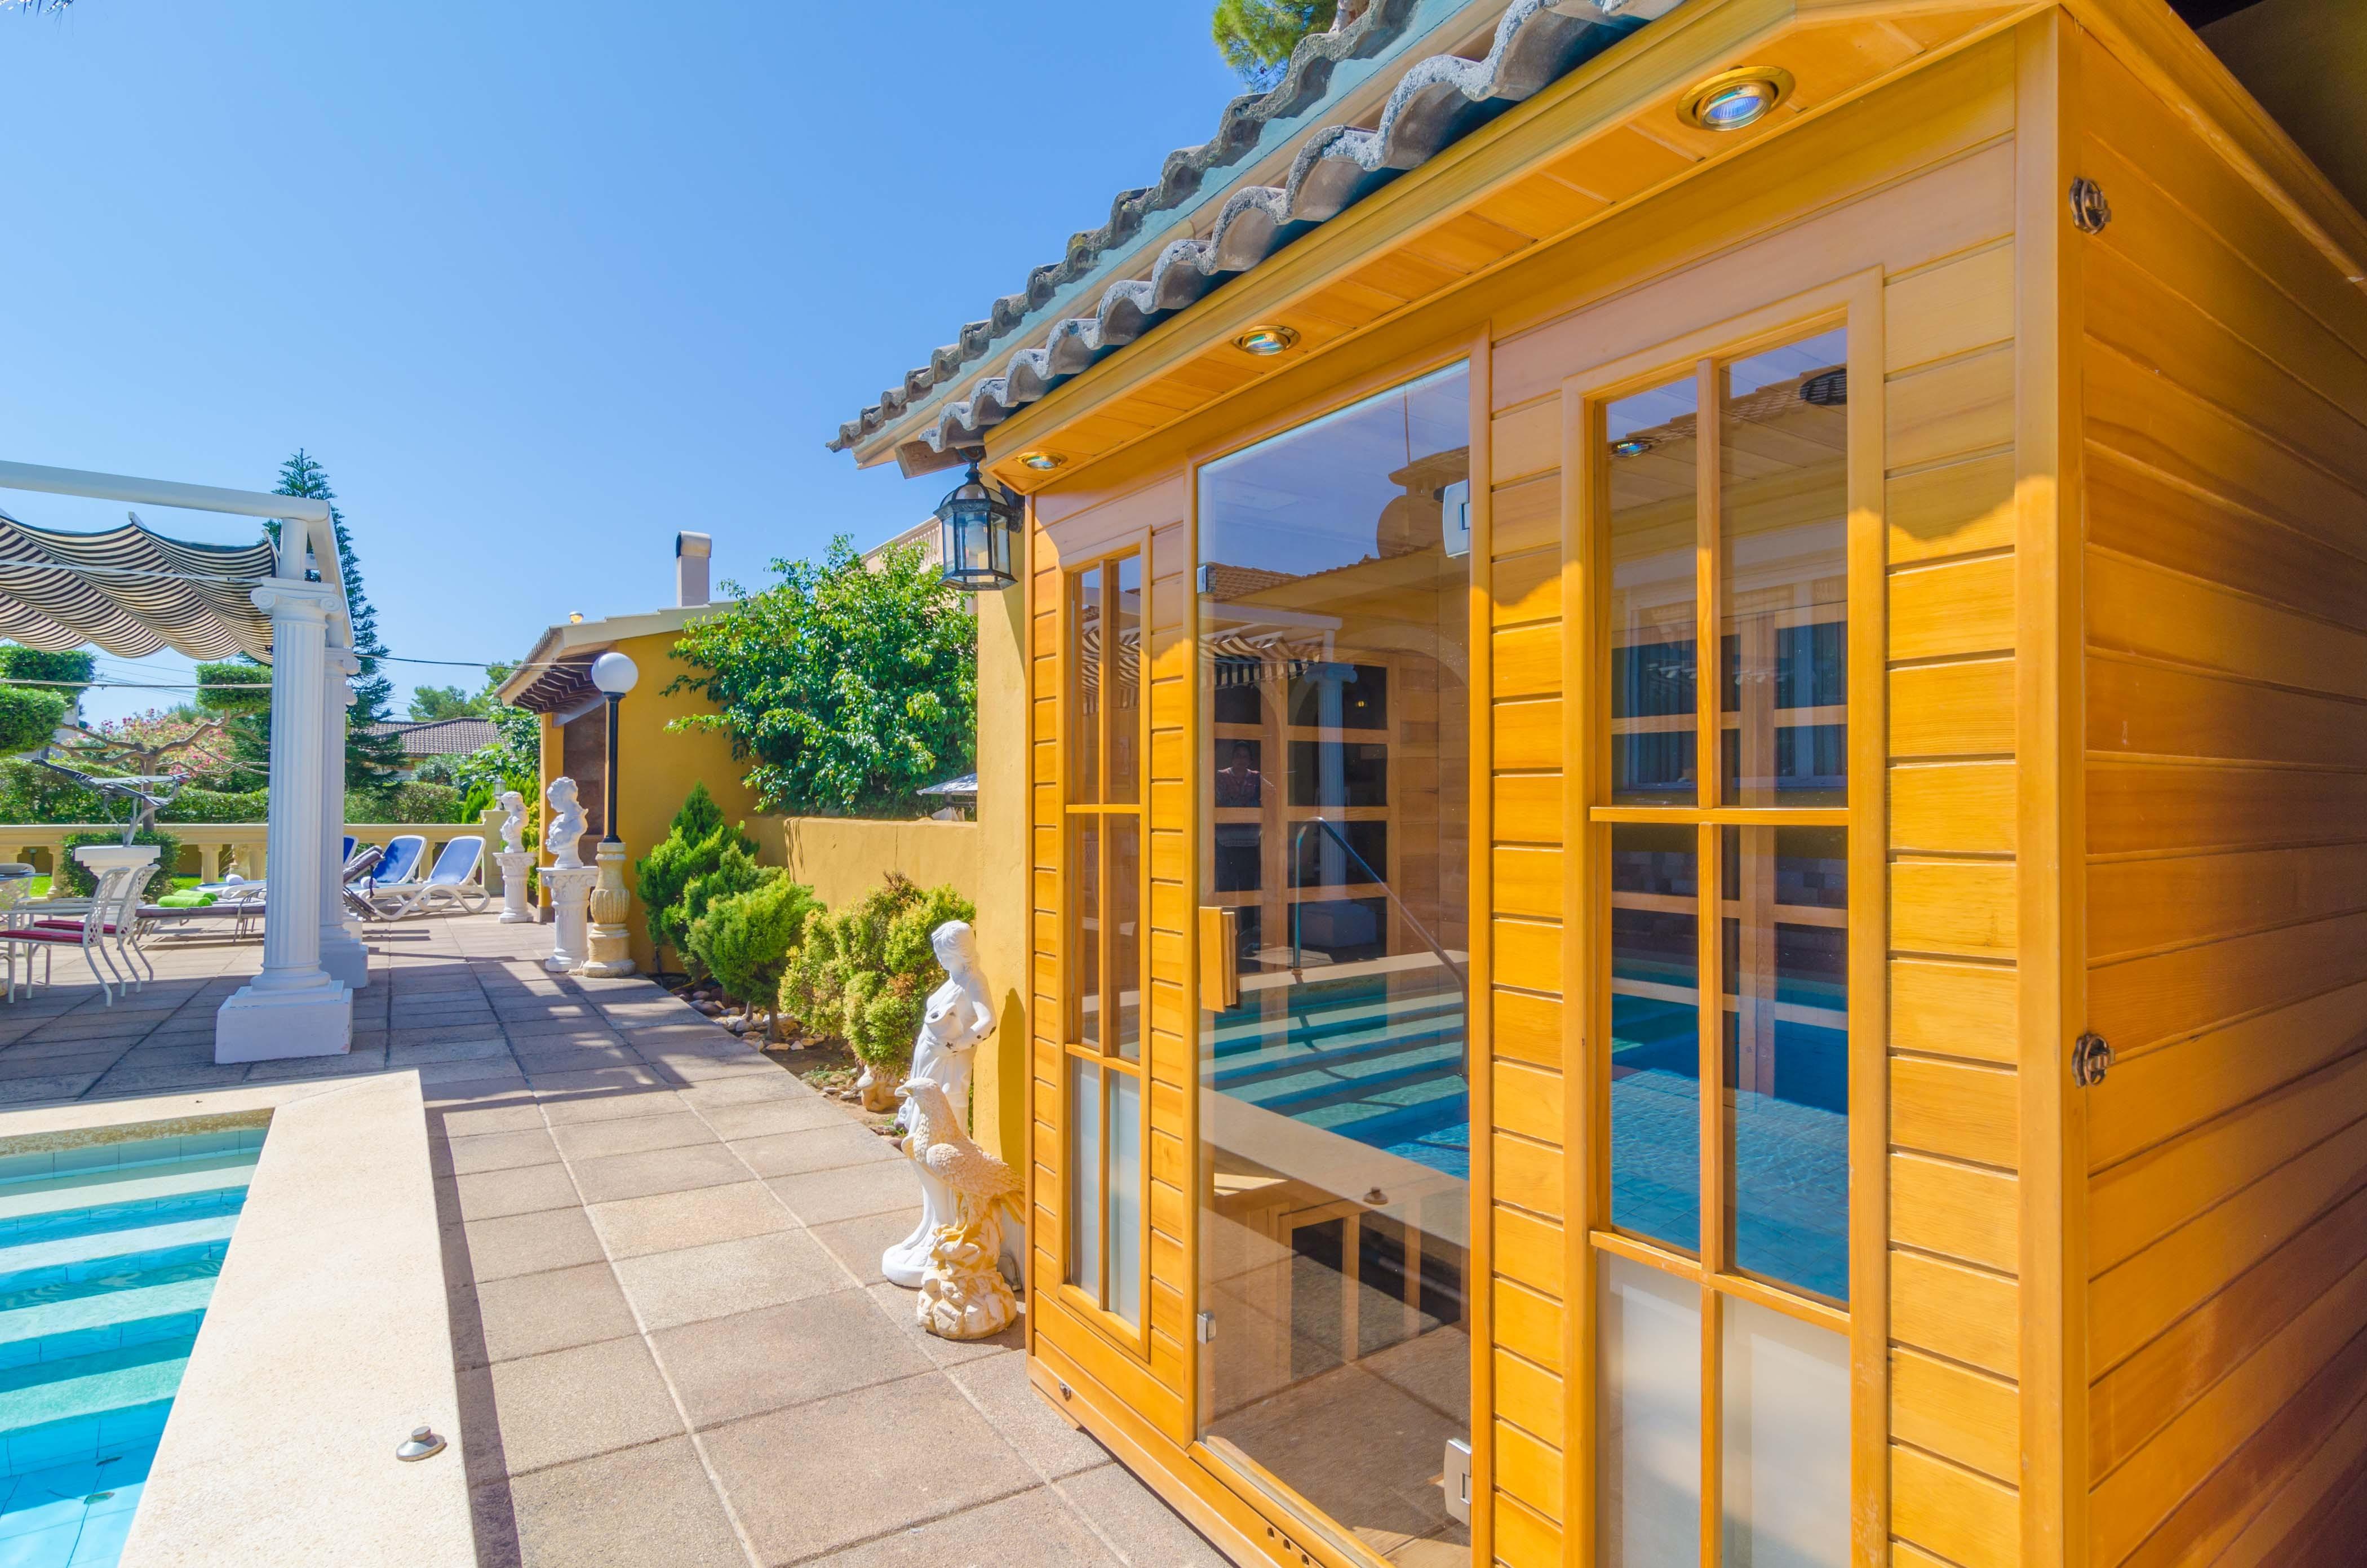 Ferienhaus CAN GORI (2296828), Badia Gran, Mallorca, Balearische Inseln, Spanien, Bild 10